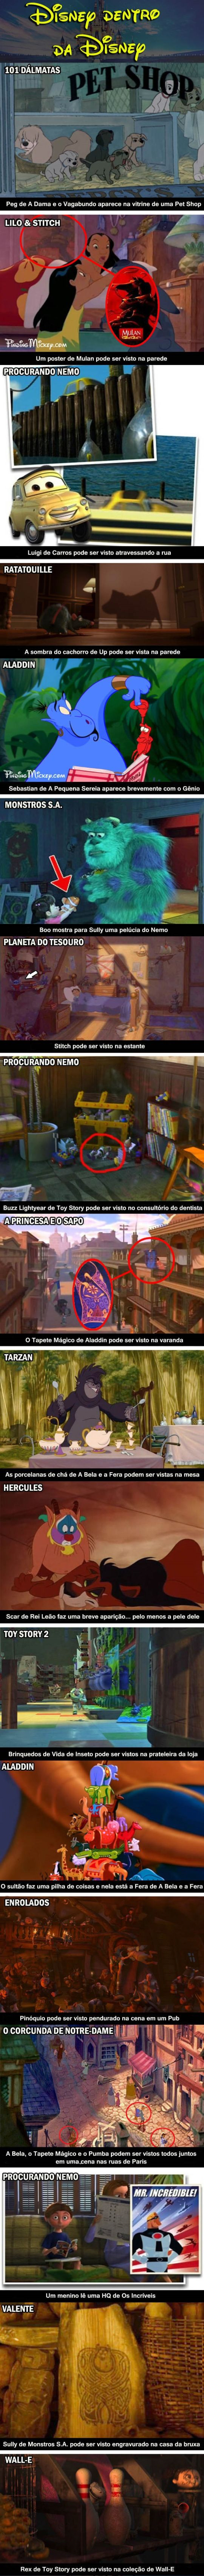 Disney dentro da Disney